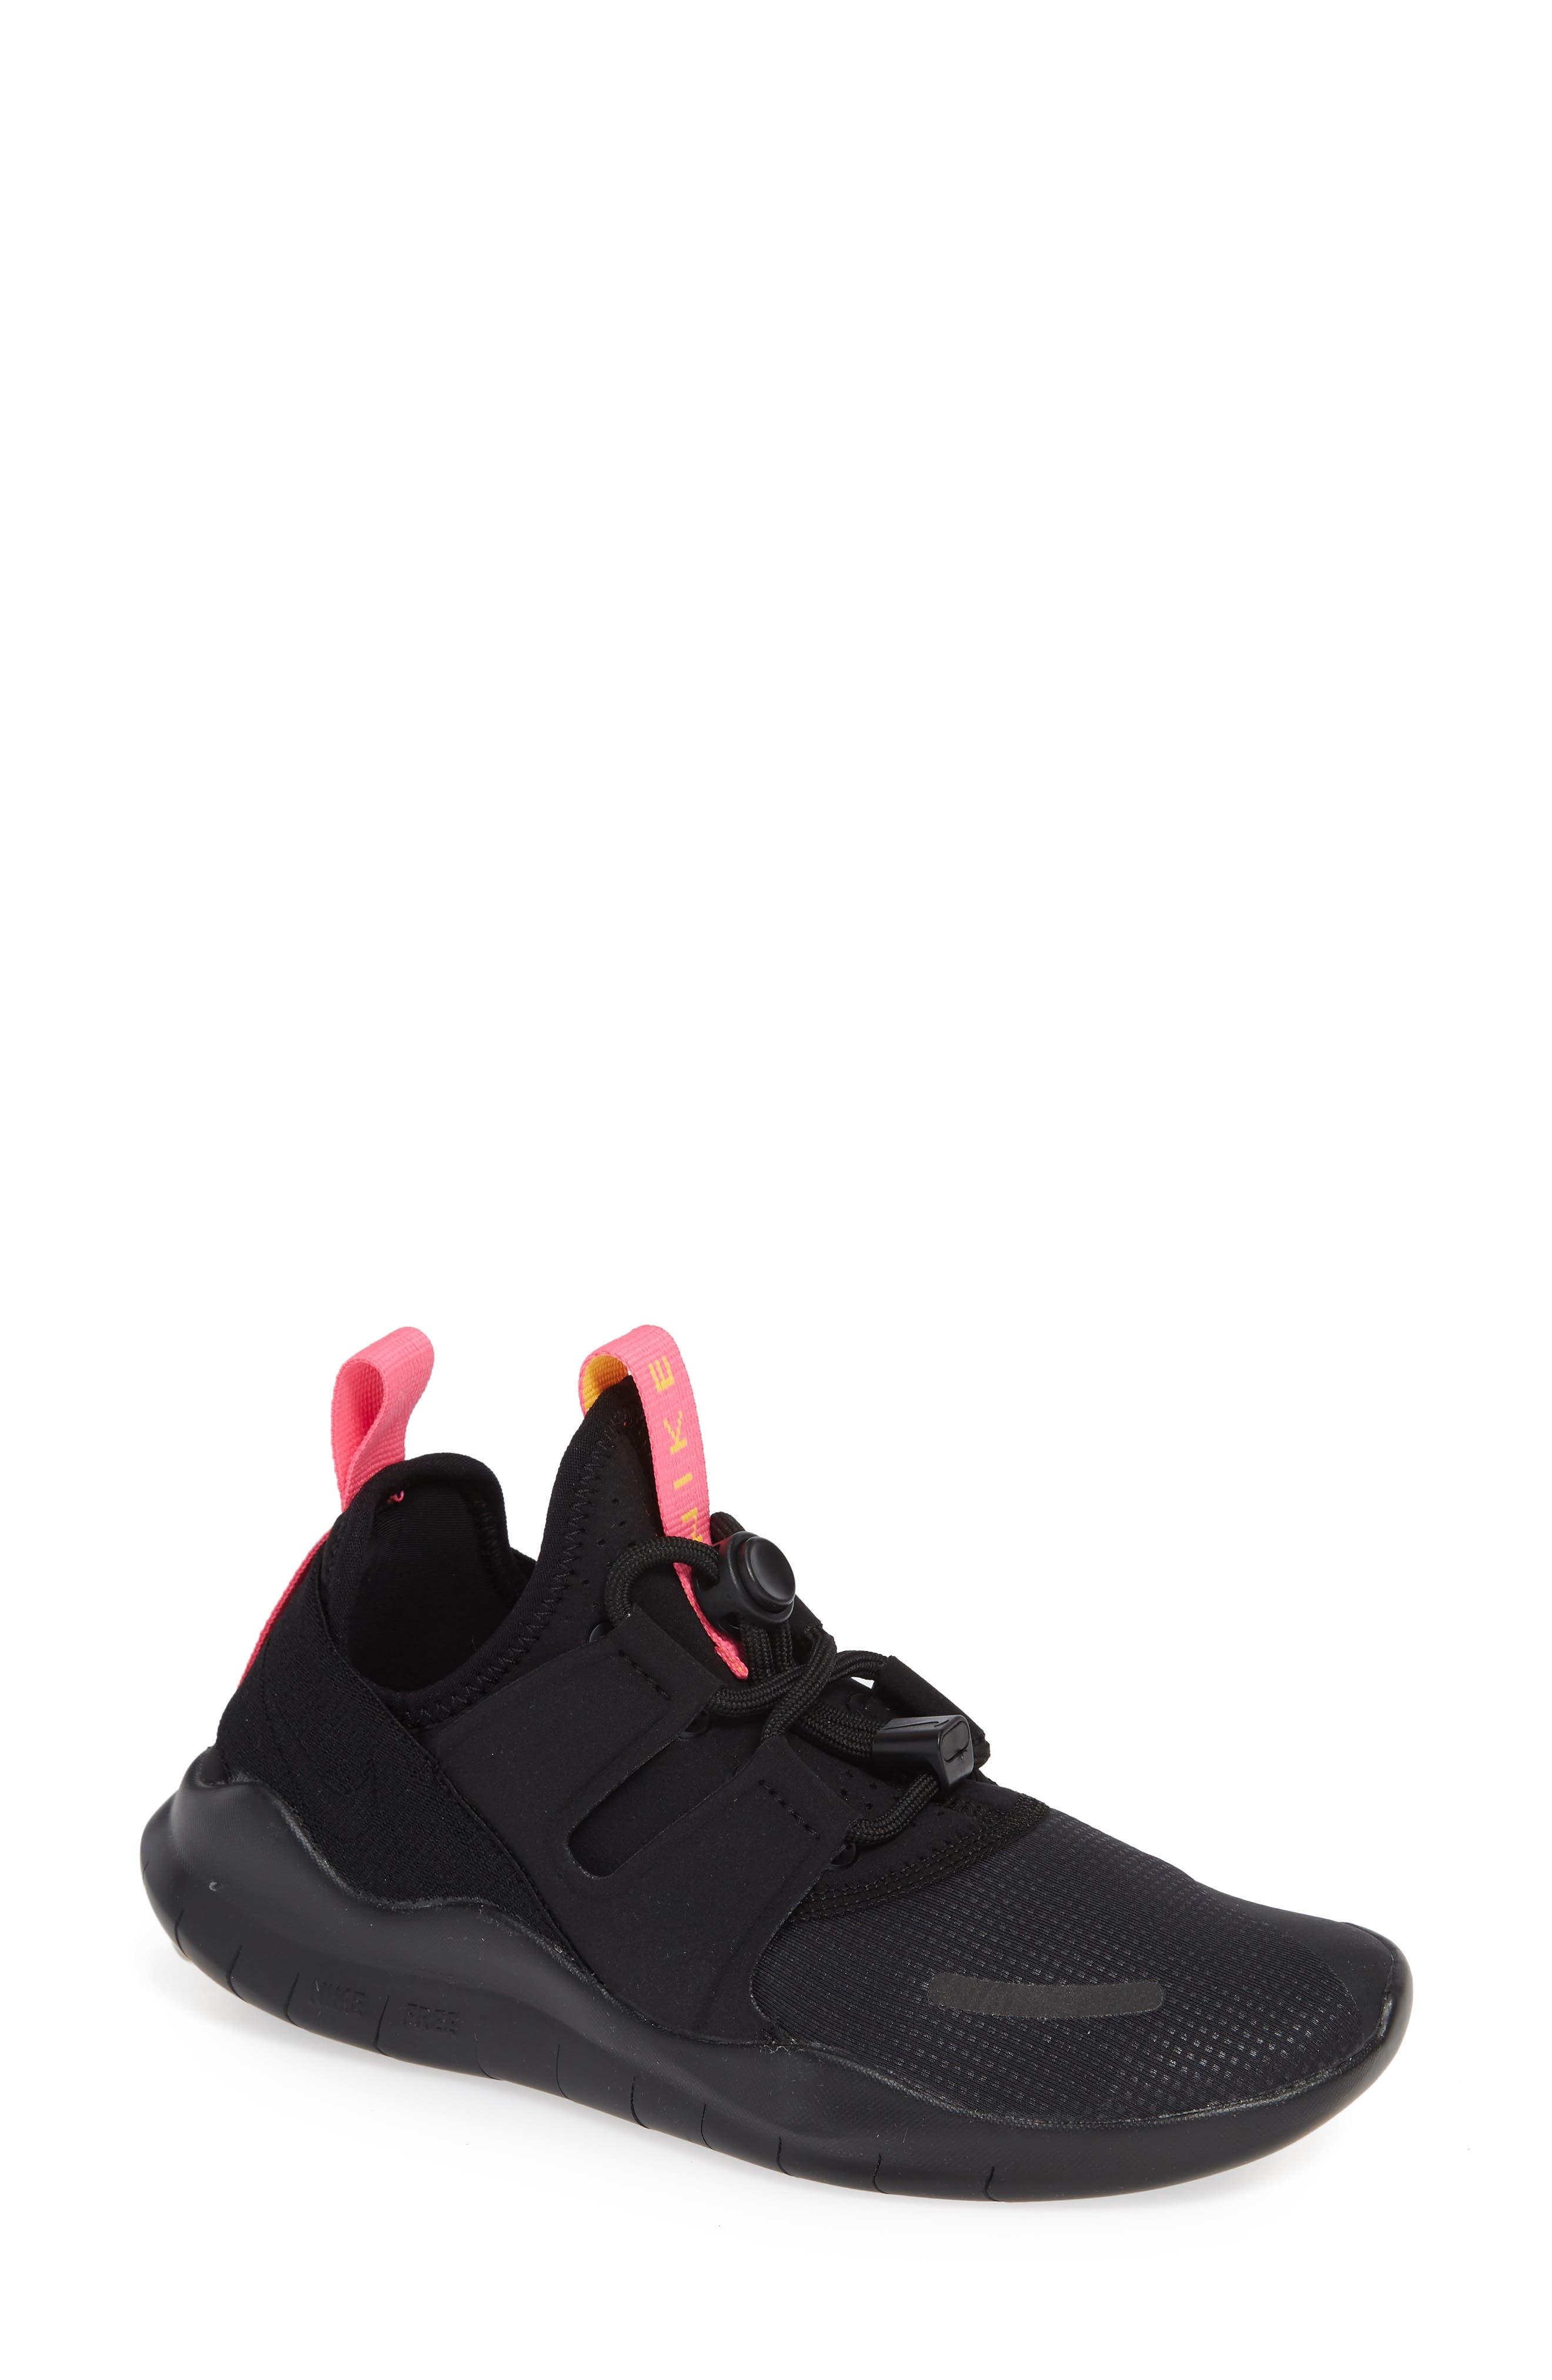 Nike Free RN Commuter 2018 Running Shoe